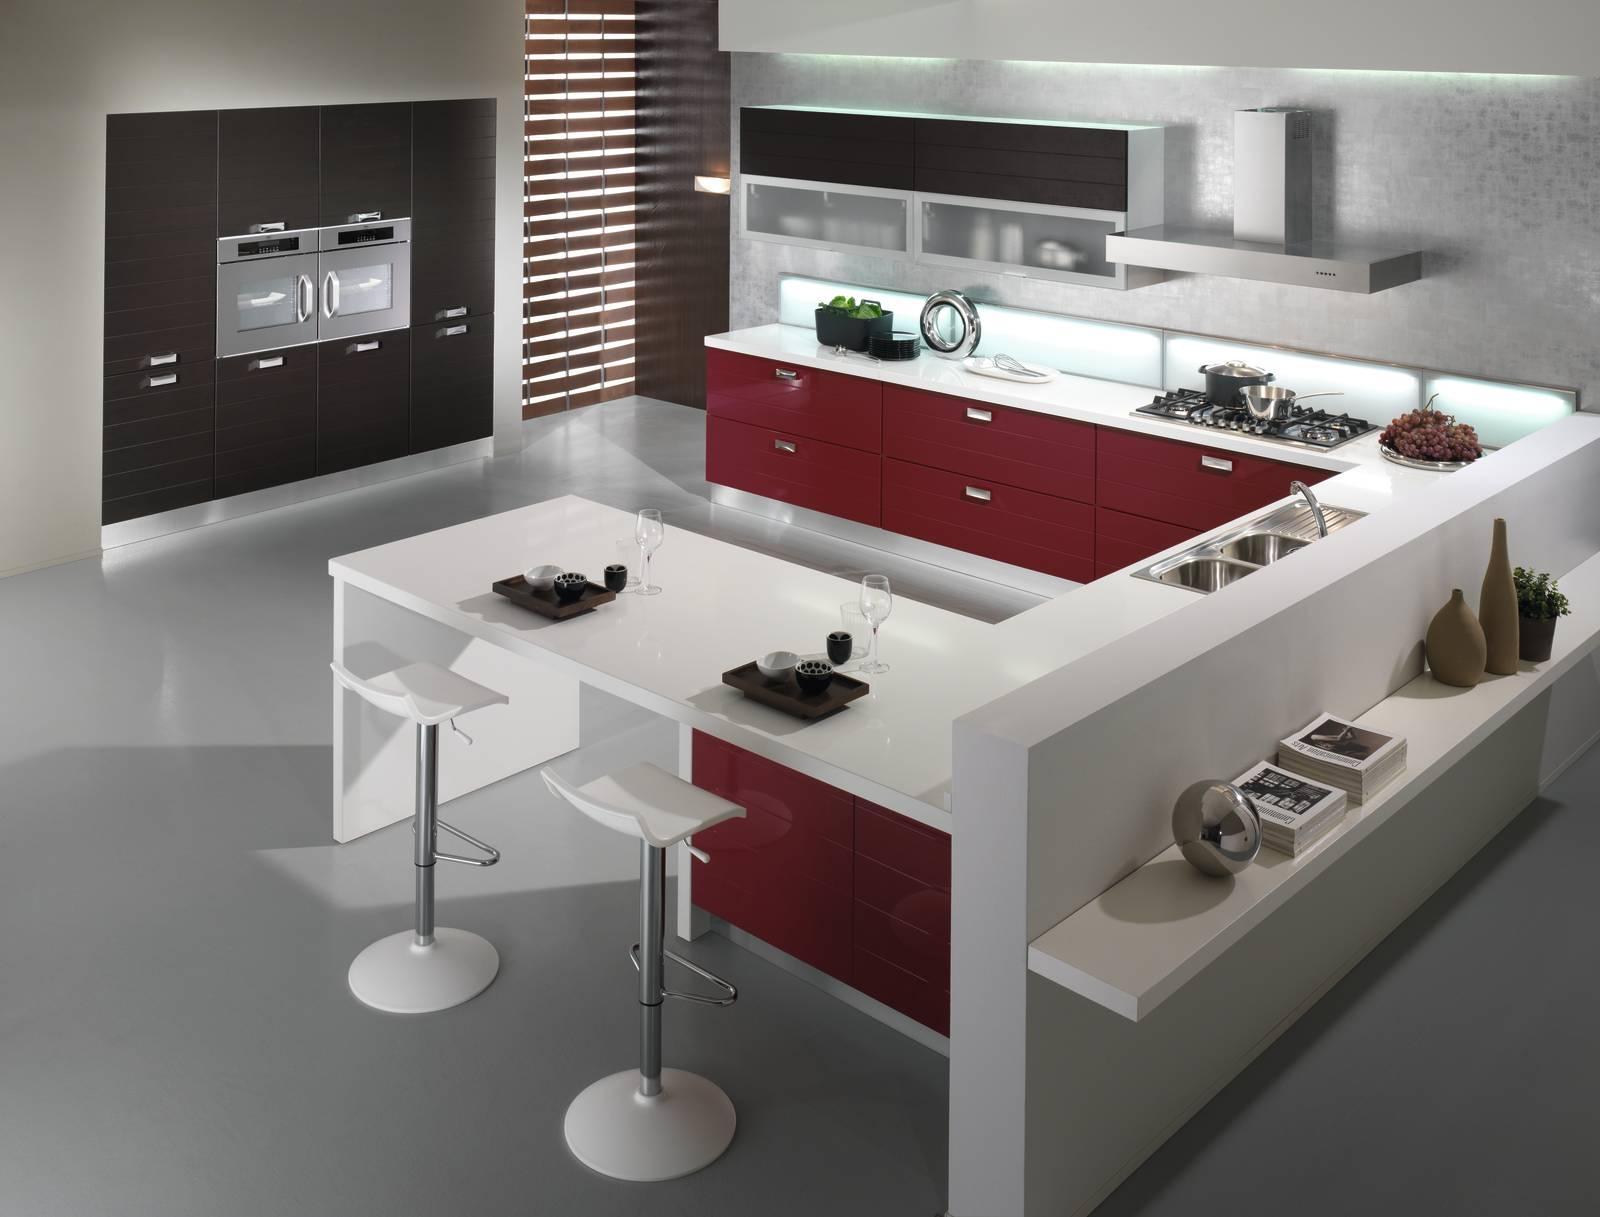 Tavoli E Sedie Da Cucina Conforama.Conforama Sgabelli Cucina Tavoli E Sedie Per Bar Ikea Conforama